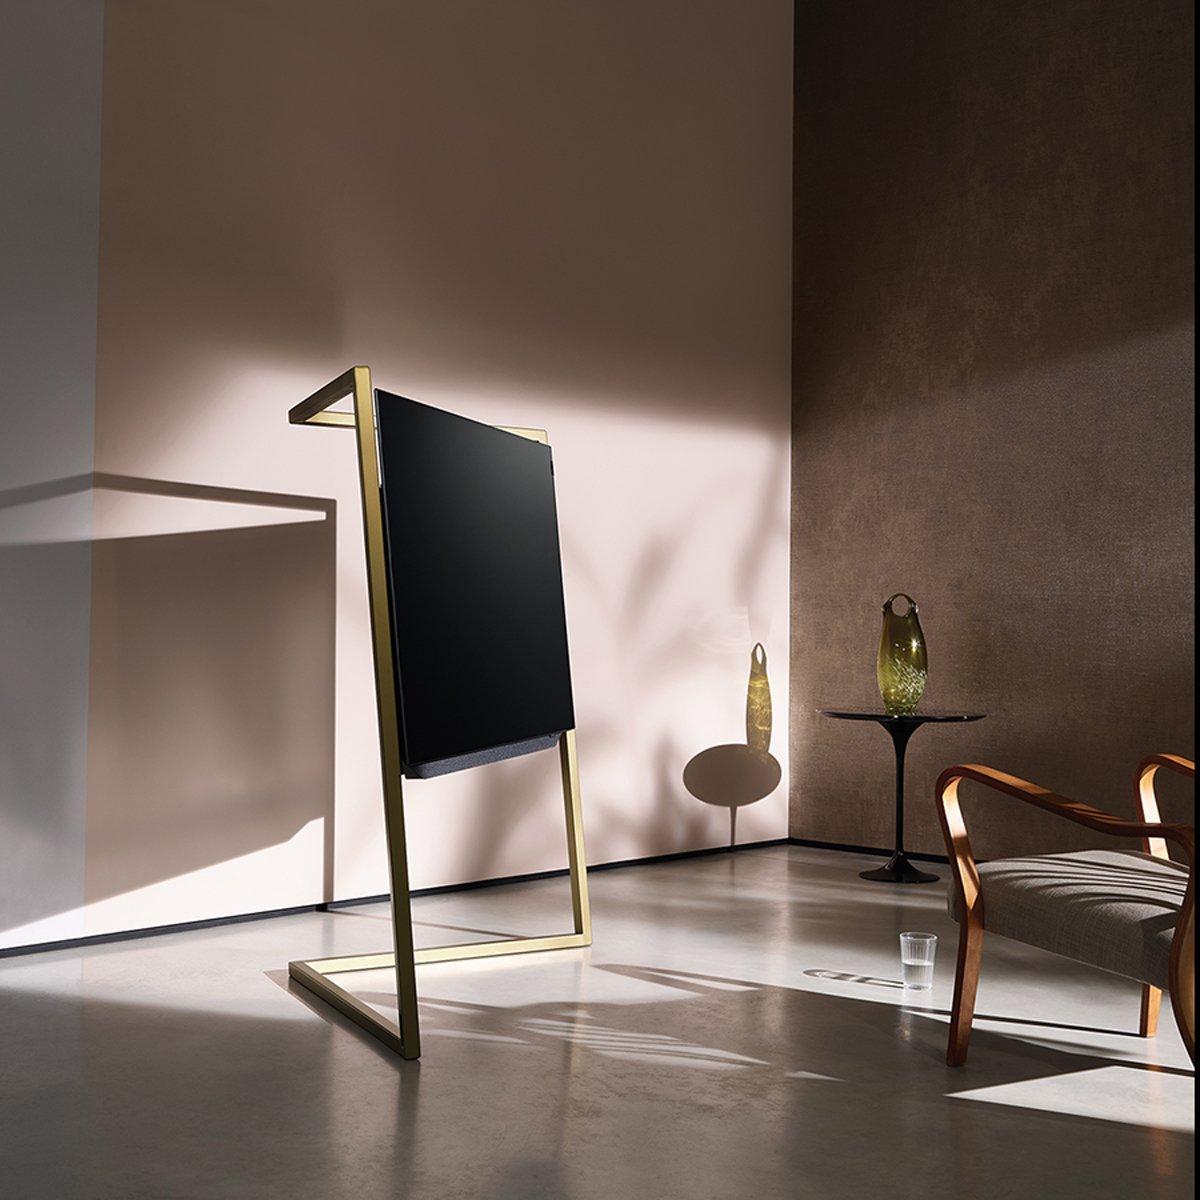 Loewe bild 9, luxe televisie